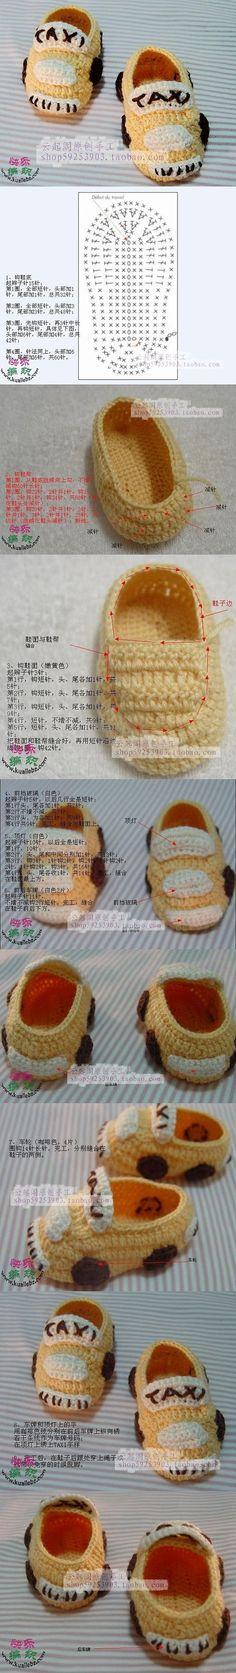 Crochet Slippers Taxi - Chart